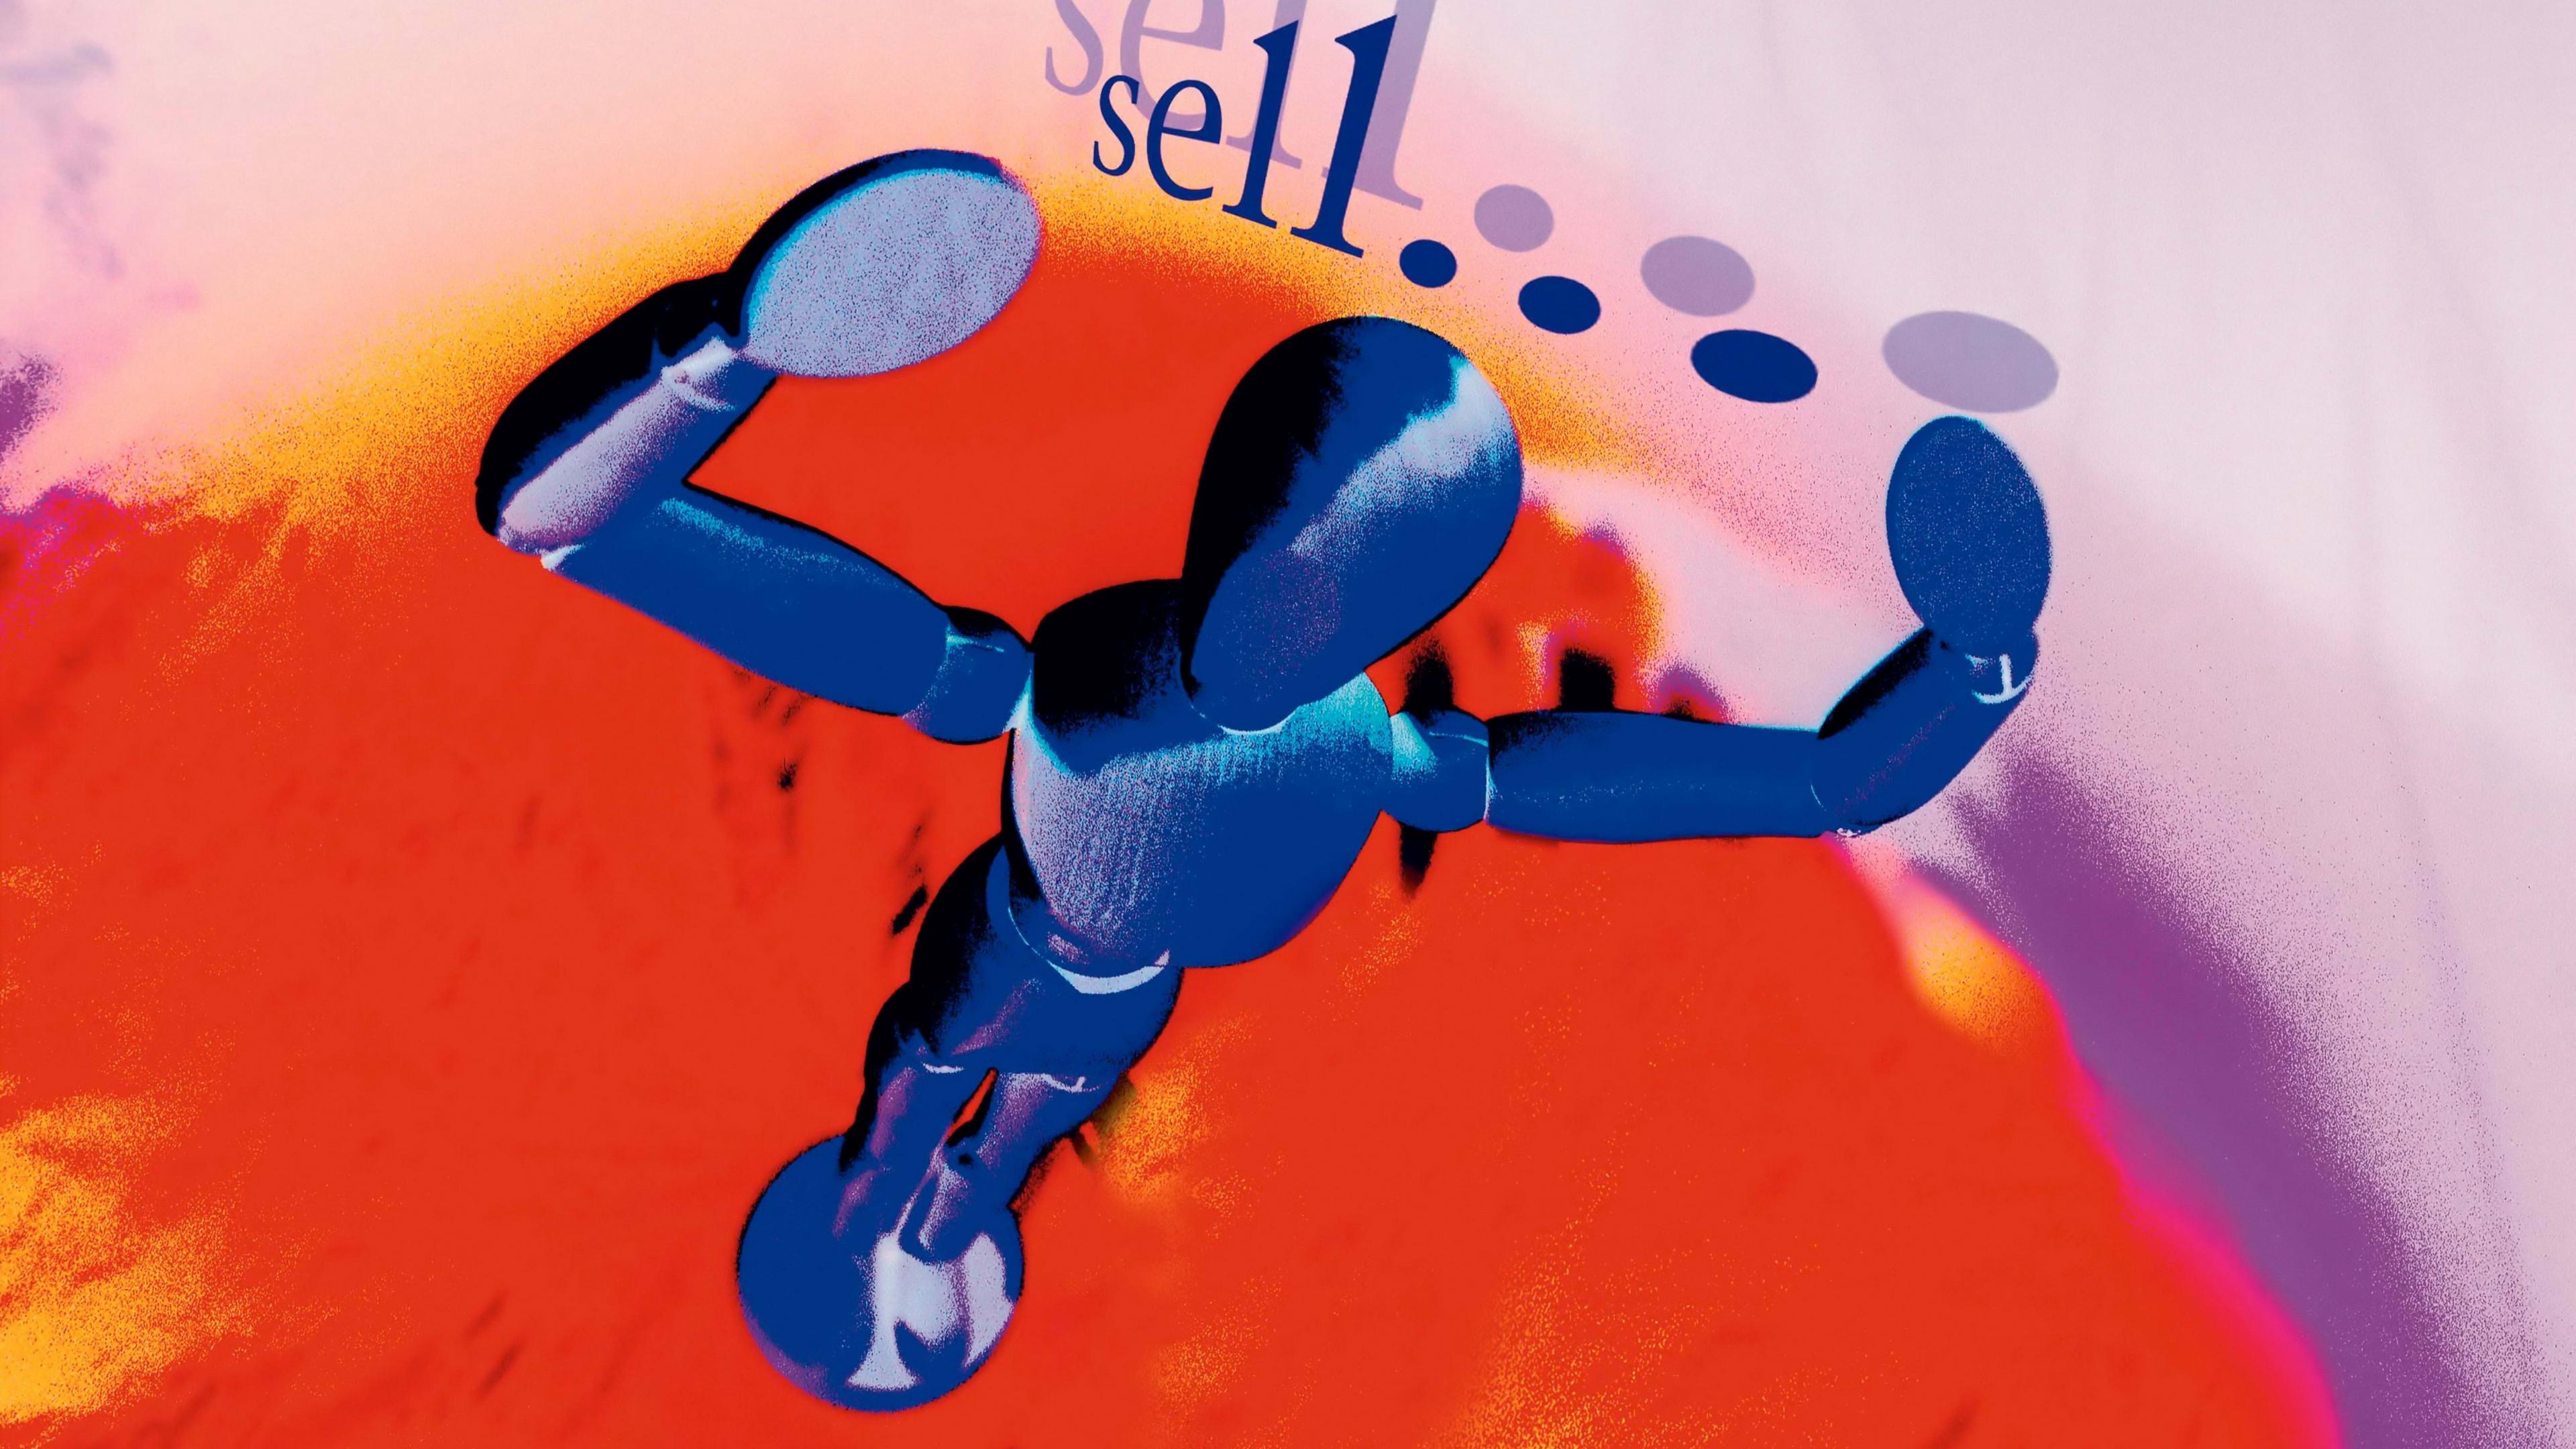 sale figure abstract people 4k 1539370508 - sale, figure, abstract, people 4k - sale, Figure, abstract